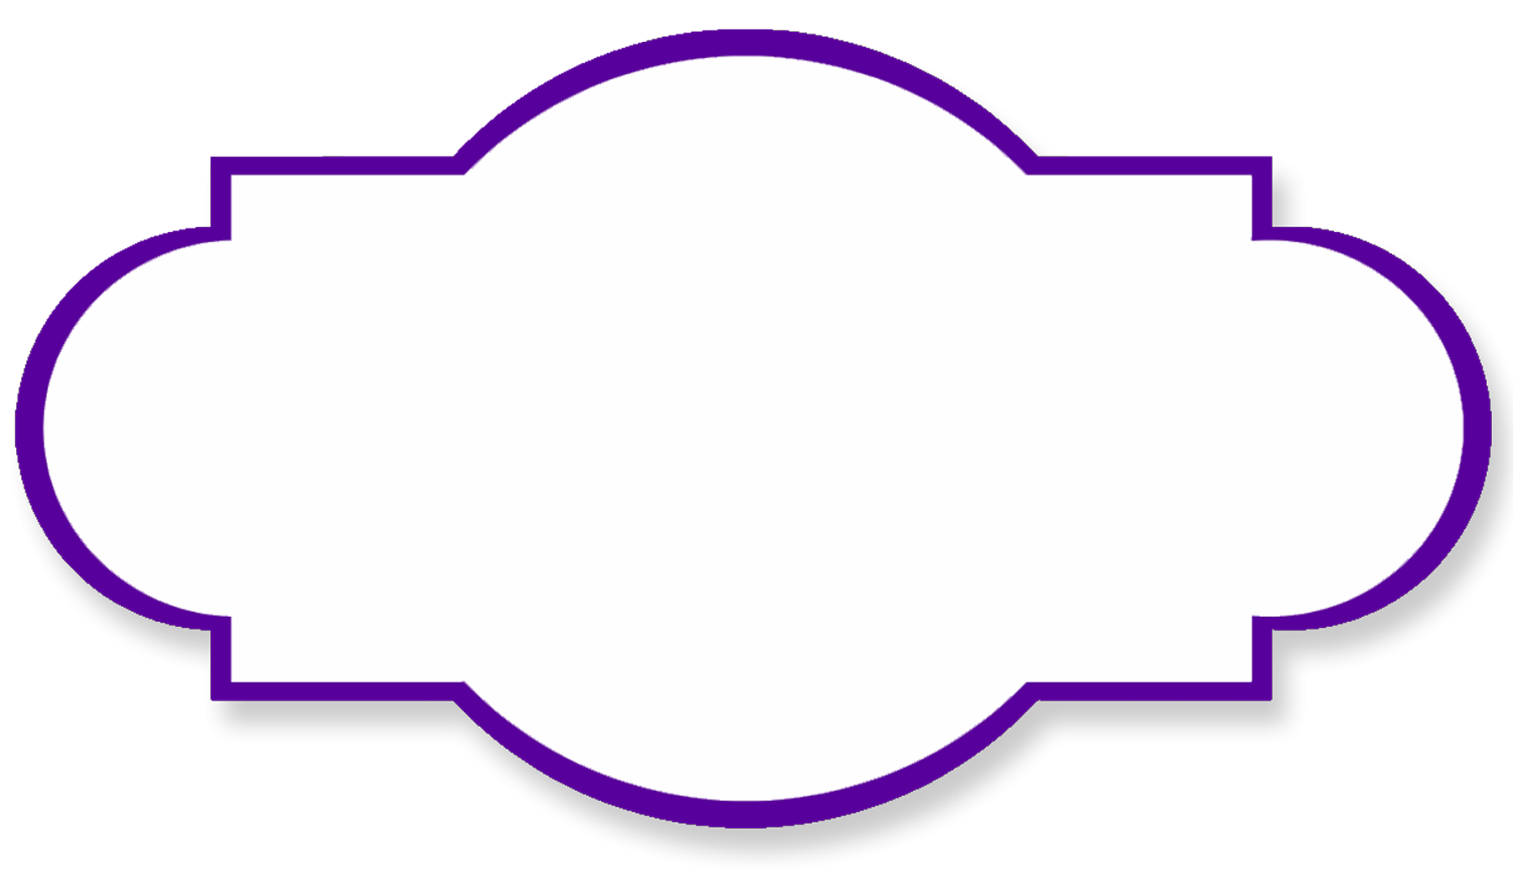 Funeral clipart borders. Purple butterfly border panda